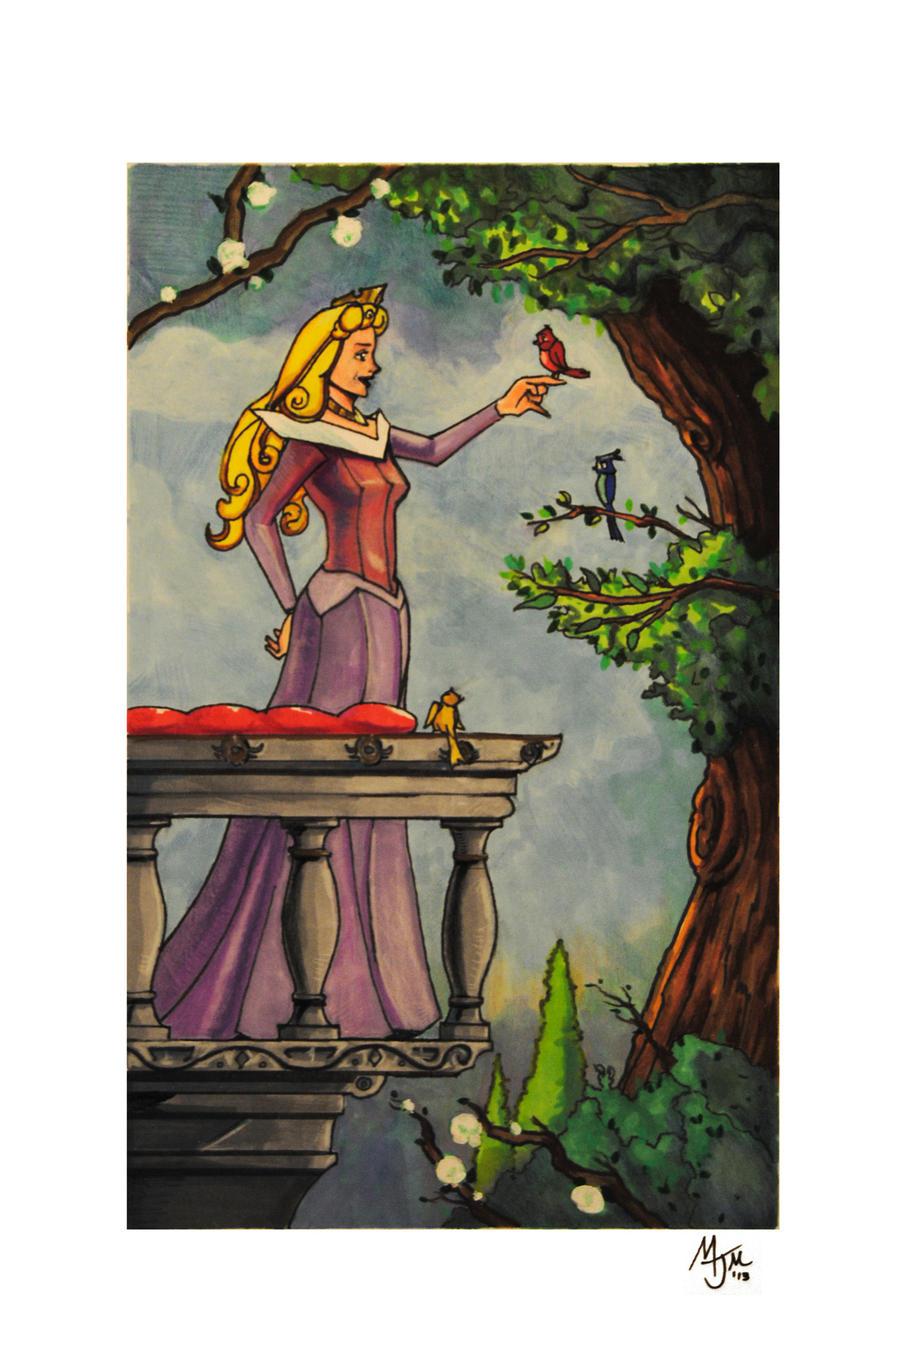 Princess Aurora On the Balcony by cqb